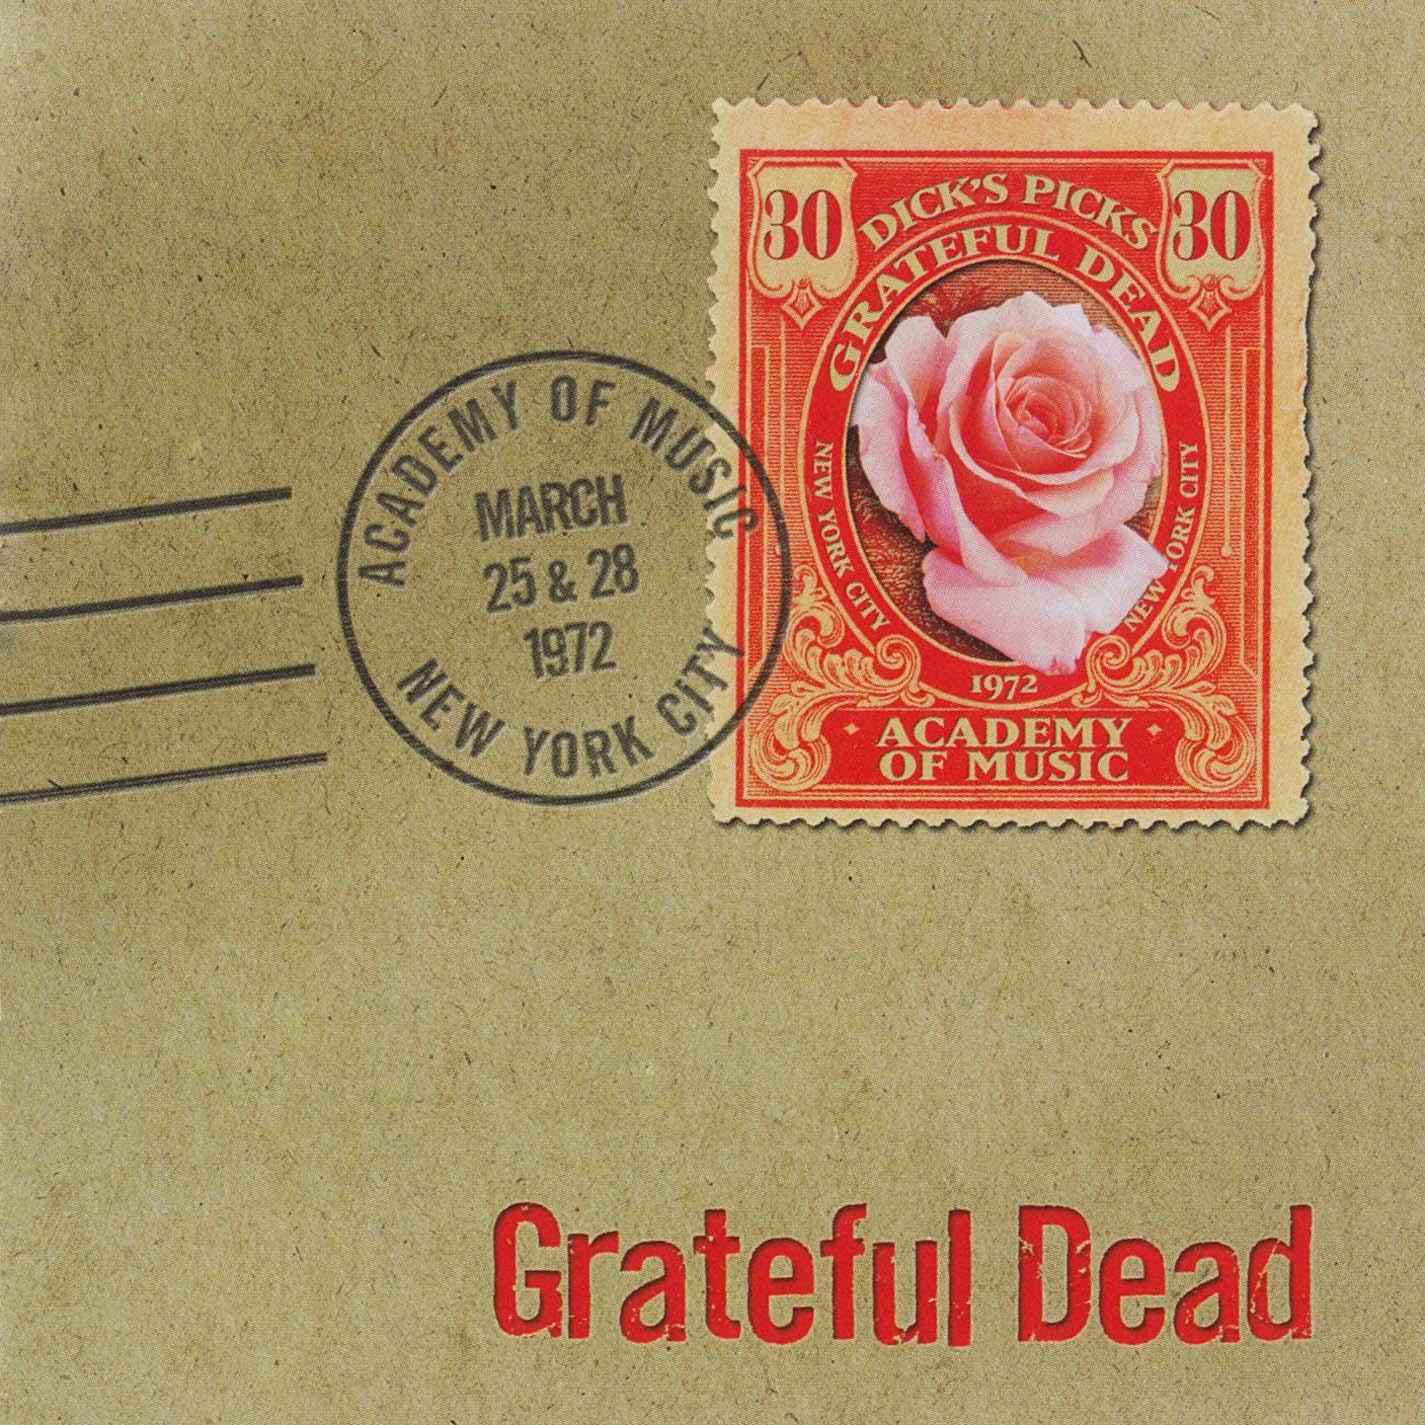 Grateful Dead Dick's Picks 30 album cover artwork